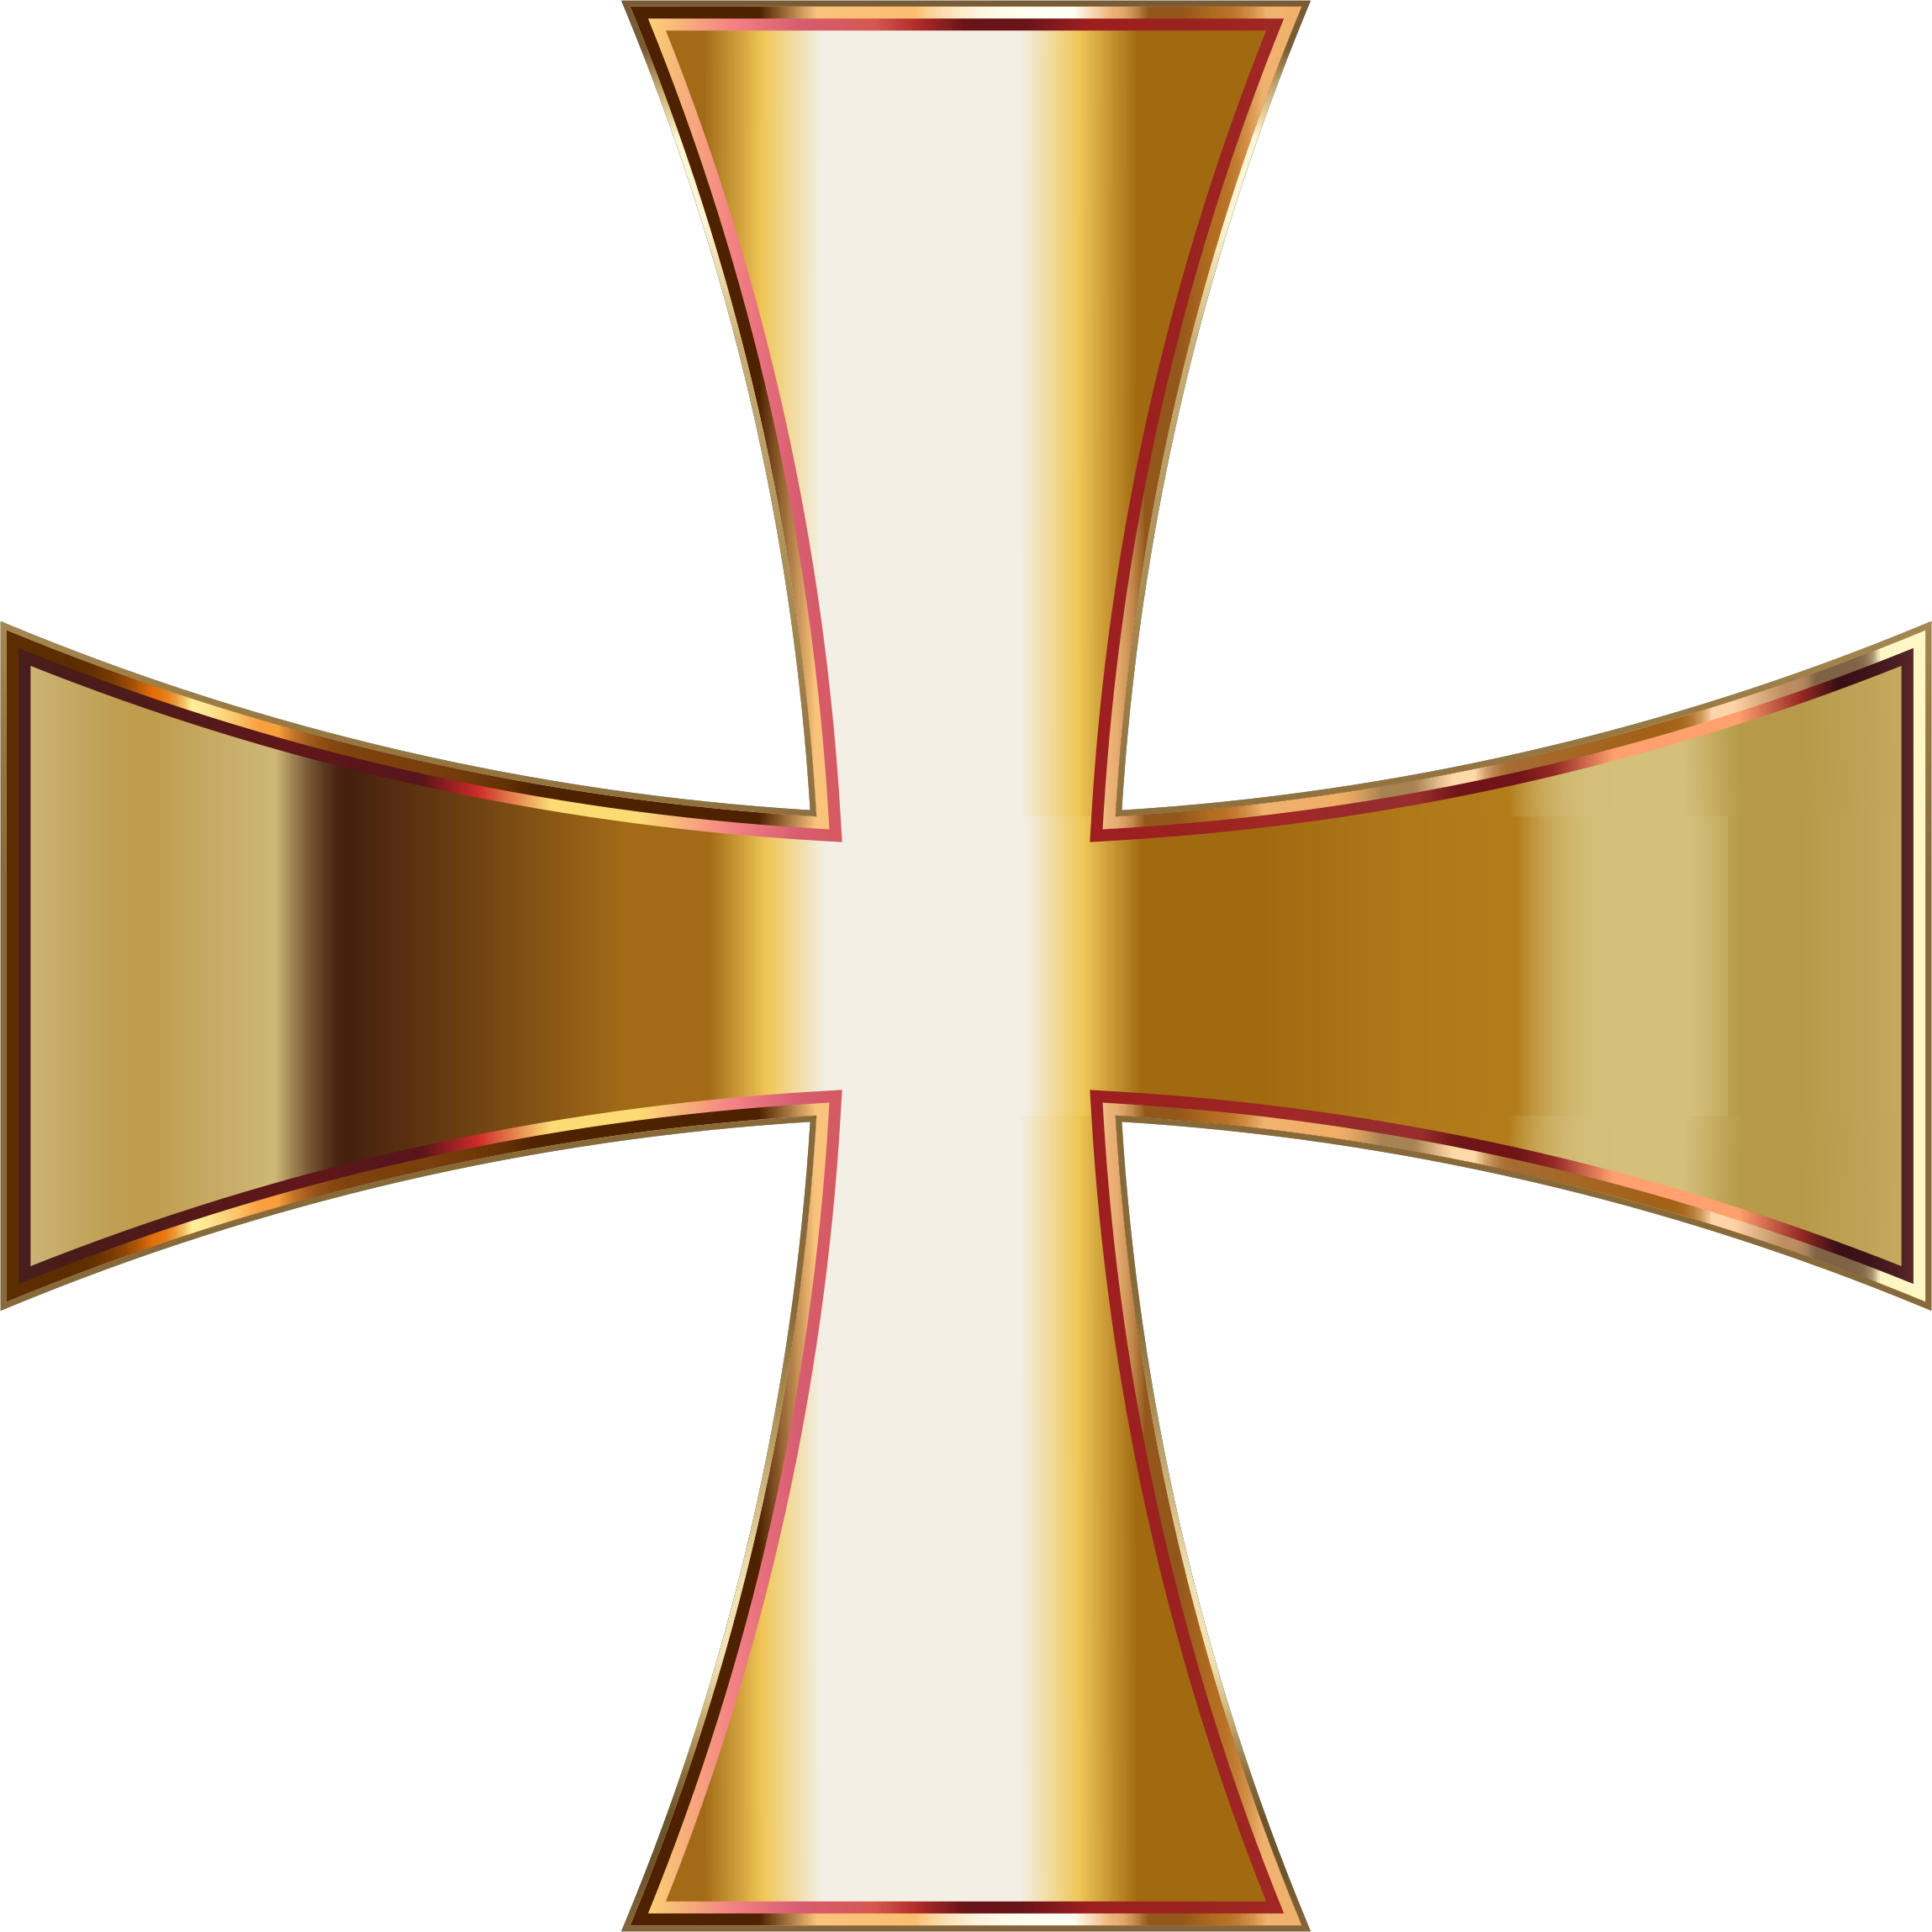 Maltese cross clipart free jpg transparent download Clipart - Gold Maltese Cross No Background jpg transparent download